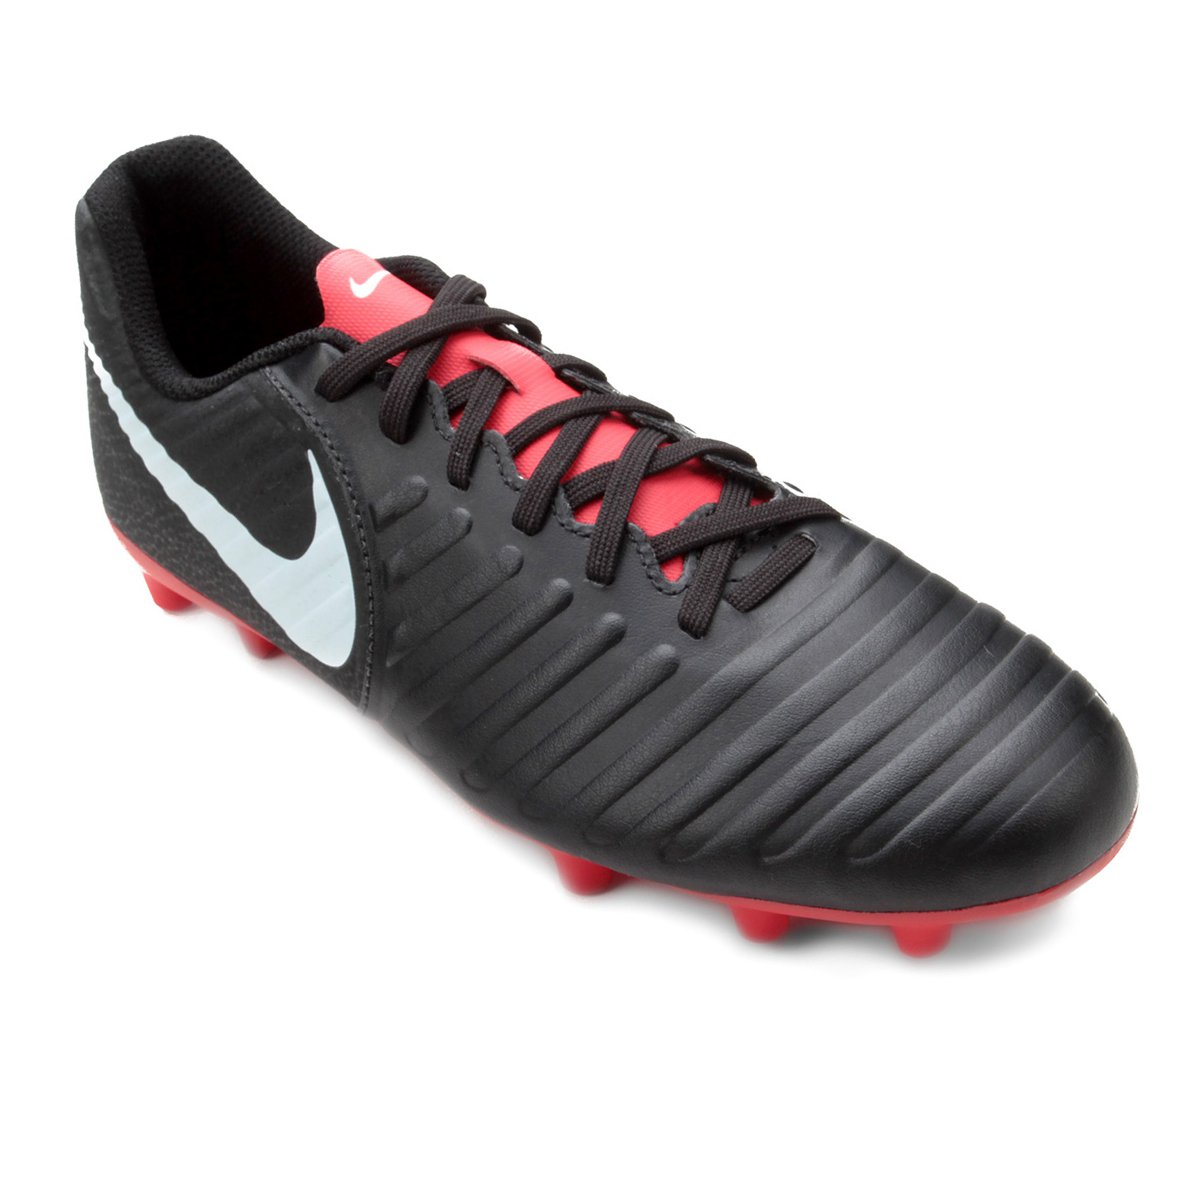 916aaccec0 Chuteira Campo Nike Tiempo Legend 7 Club FG - Preto - Compre Agora ...